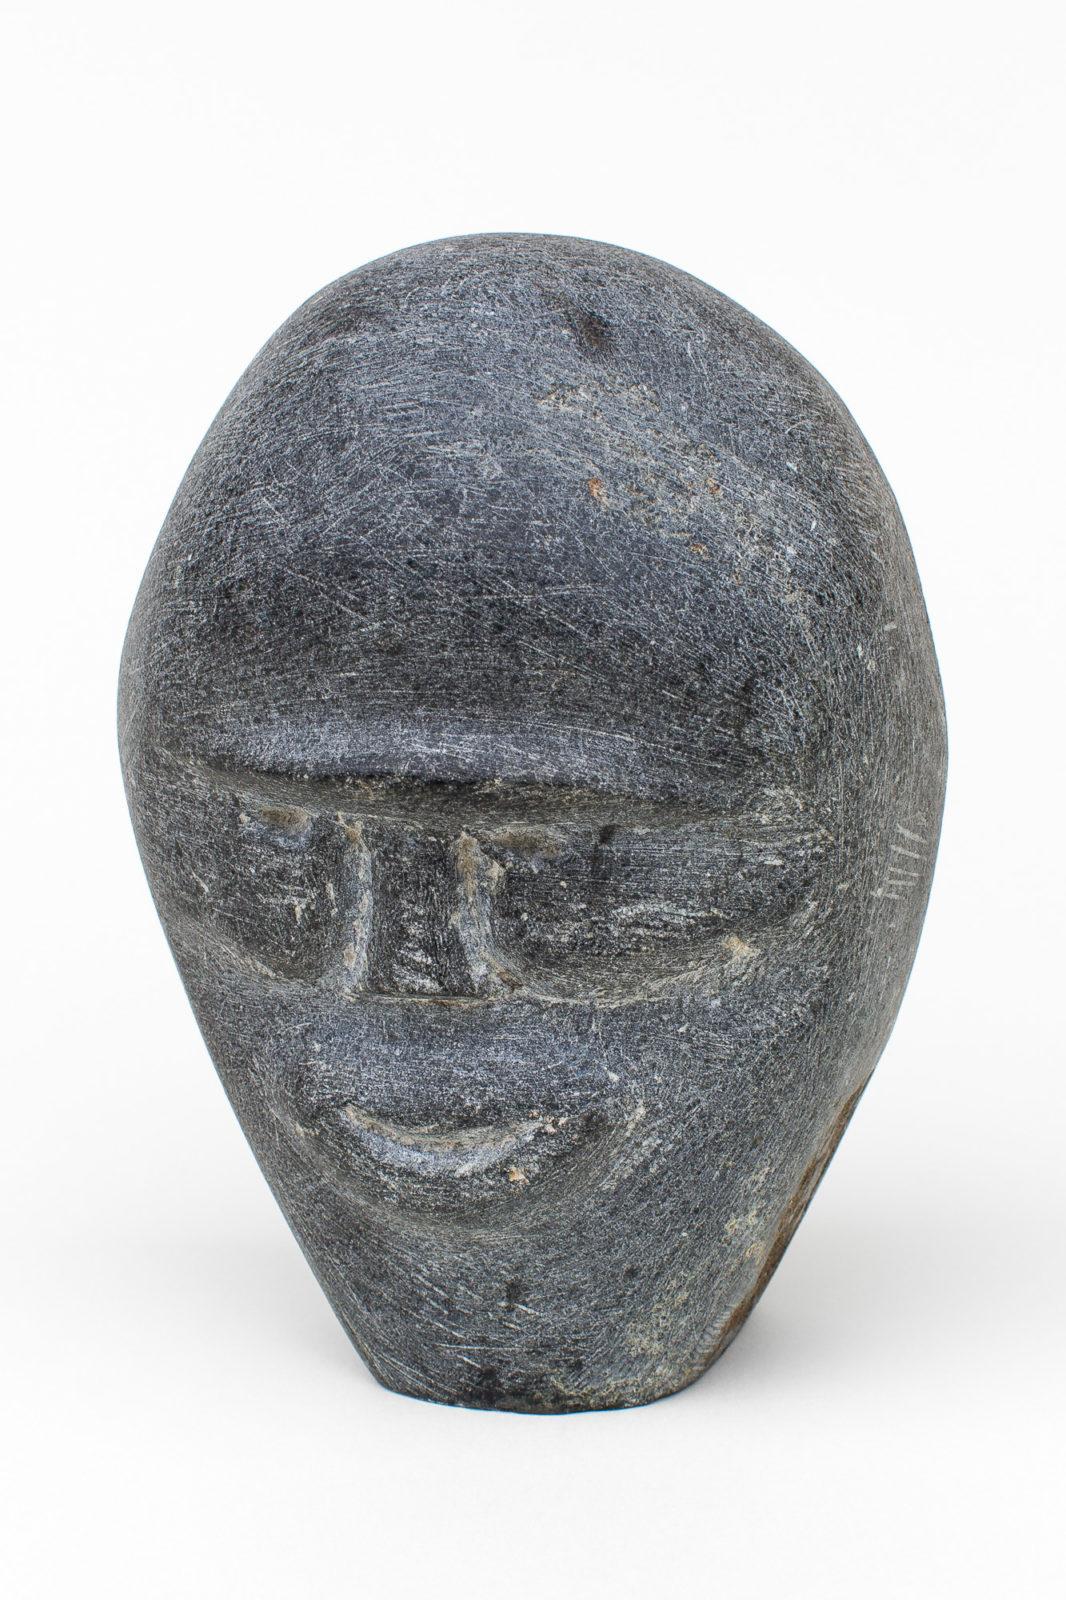 John Tiktak - untitled (head with baseball cap)